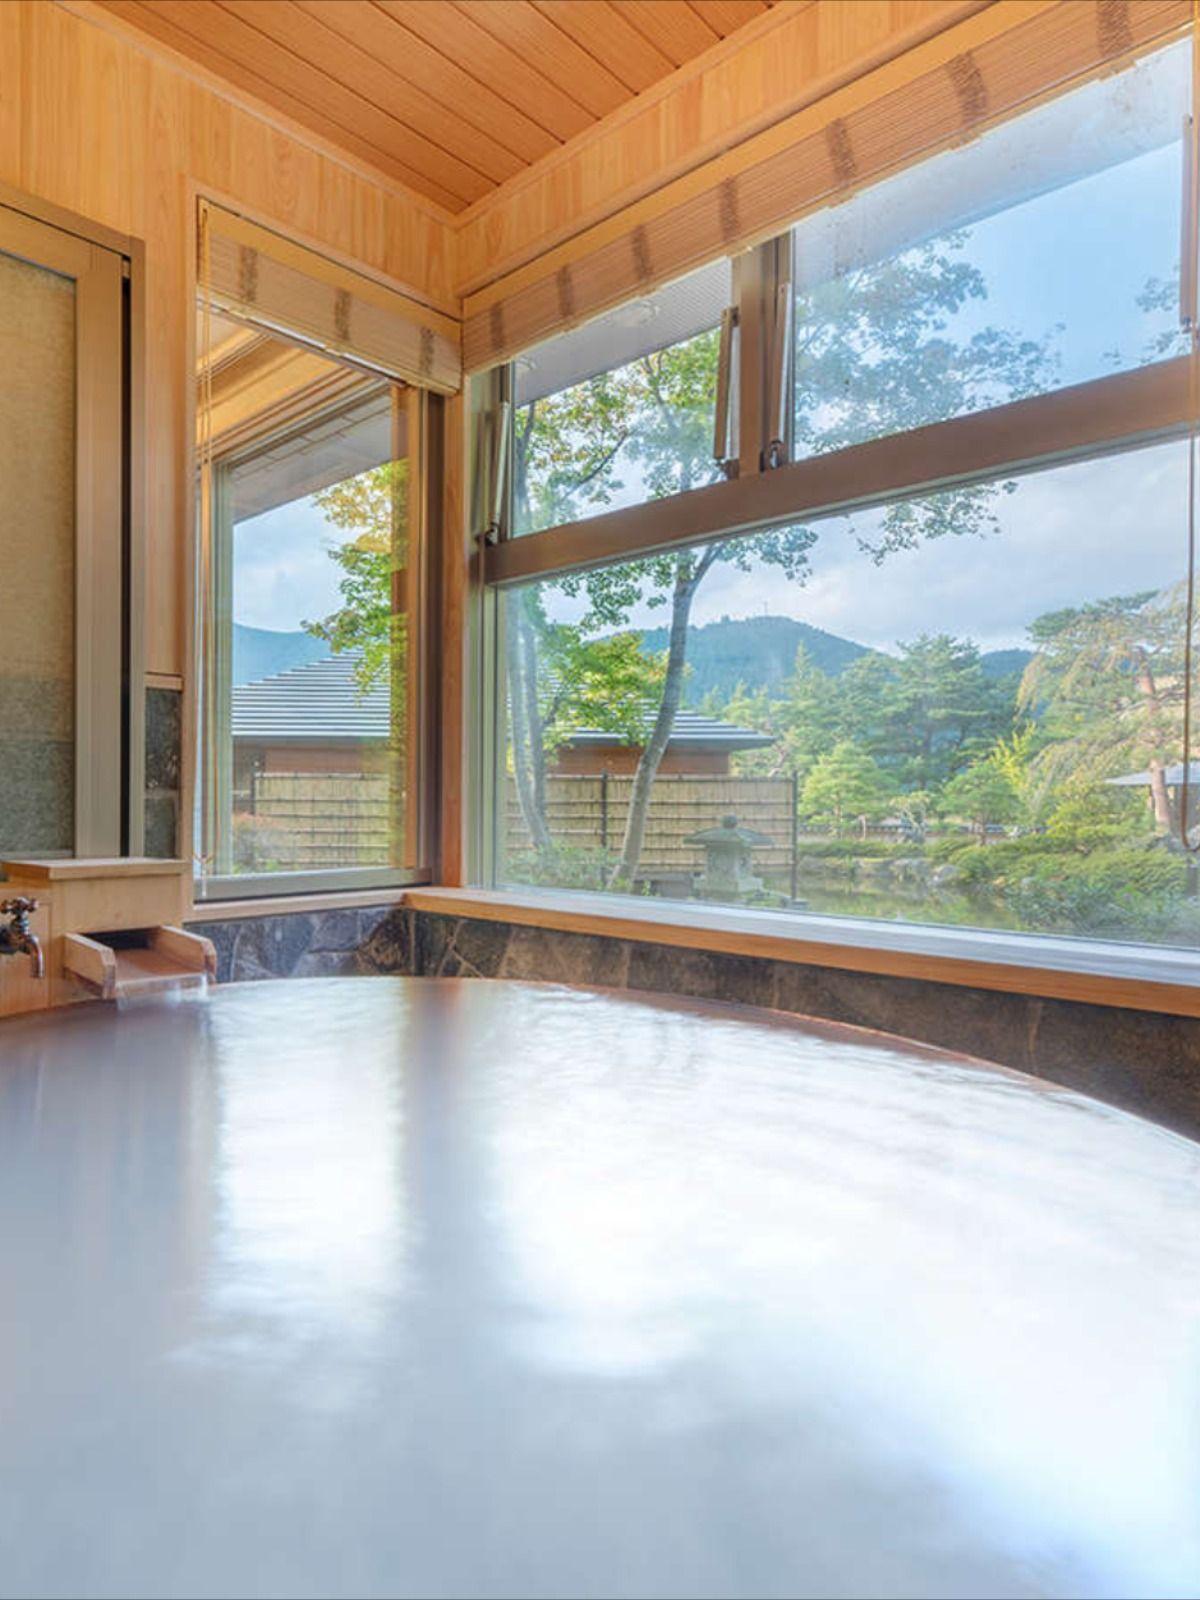 楽天トラベル 鳴子温泉 湯元 吉祥 宿泊予約 2021 旅館 温泉 宿 温泉